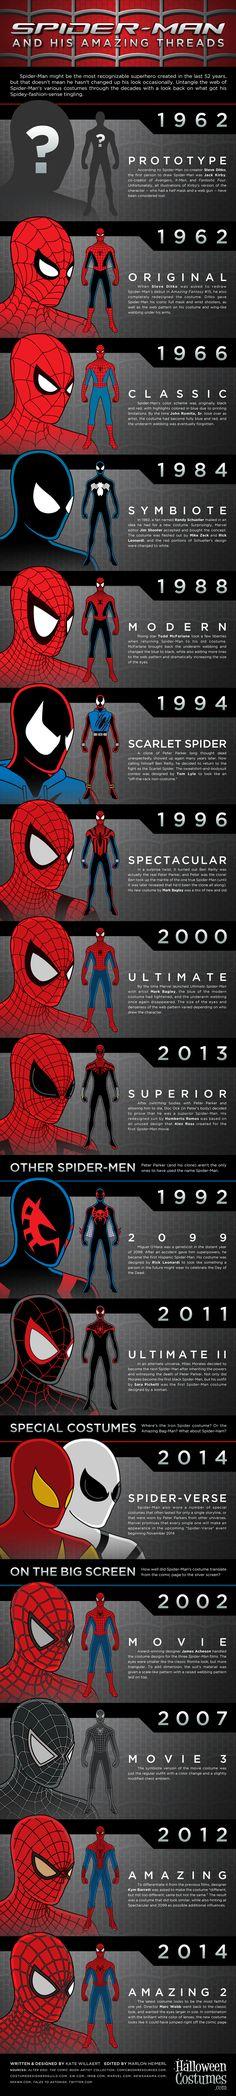 Spider-Man Infographic Costume Evolution 1962-2014 — GeekTyrant